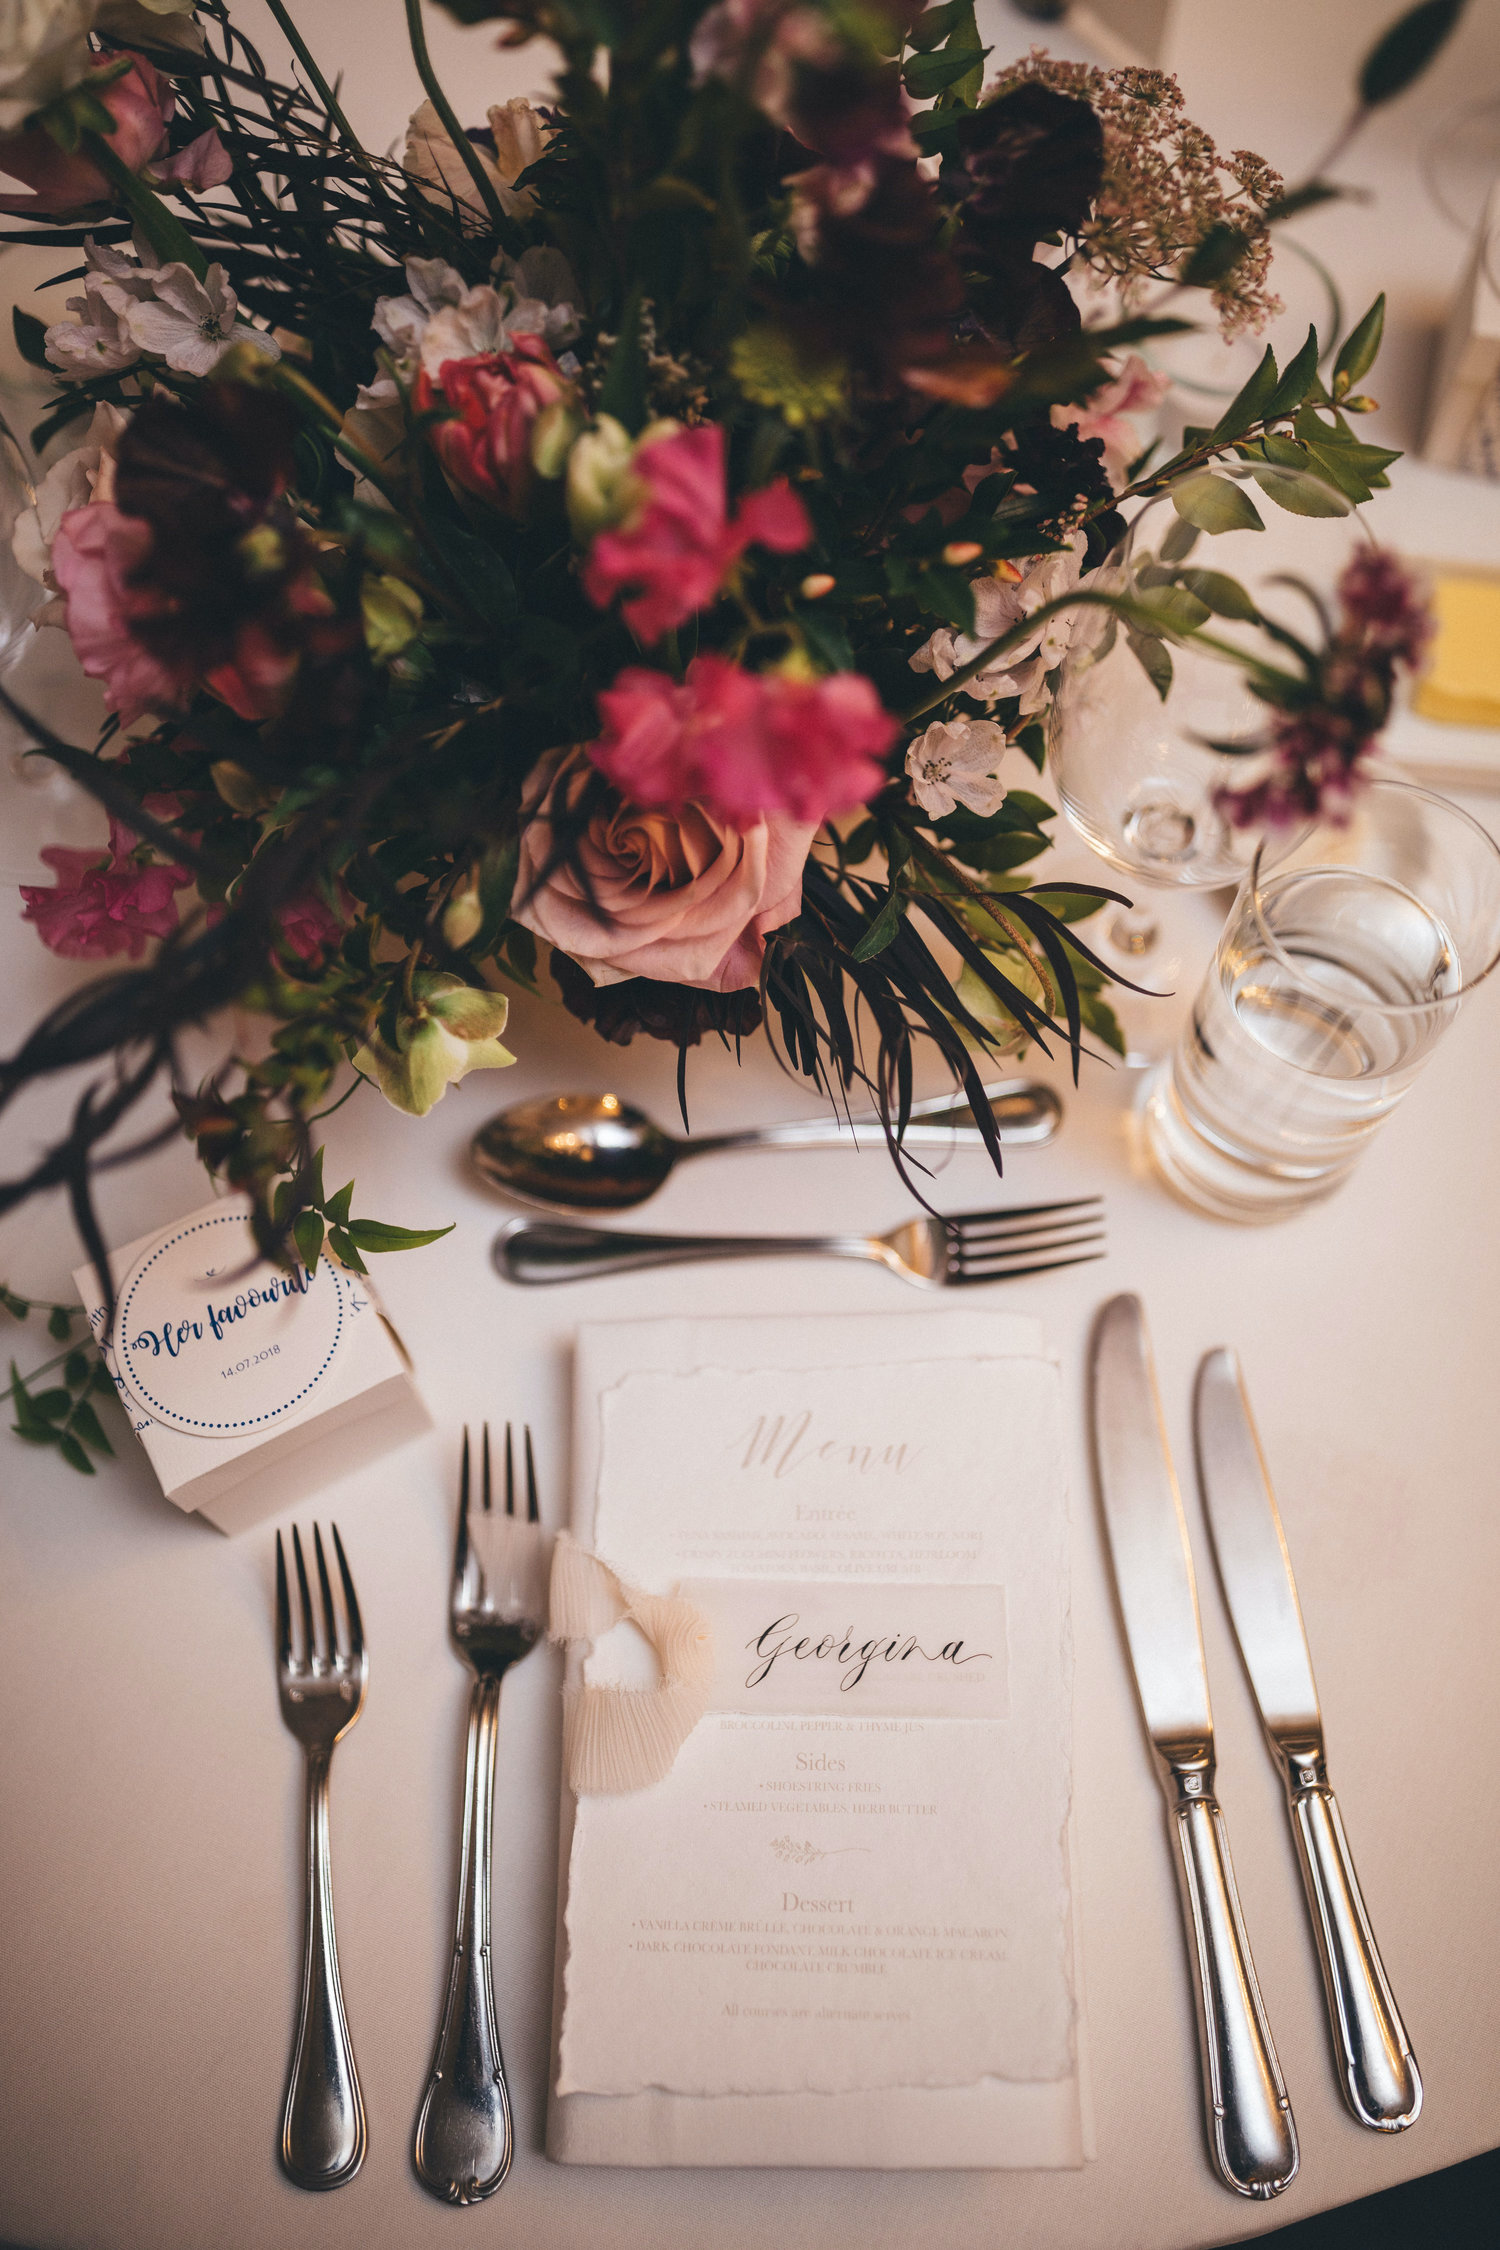 gunners barracks sydney wedding reception styling table flowers